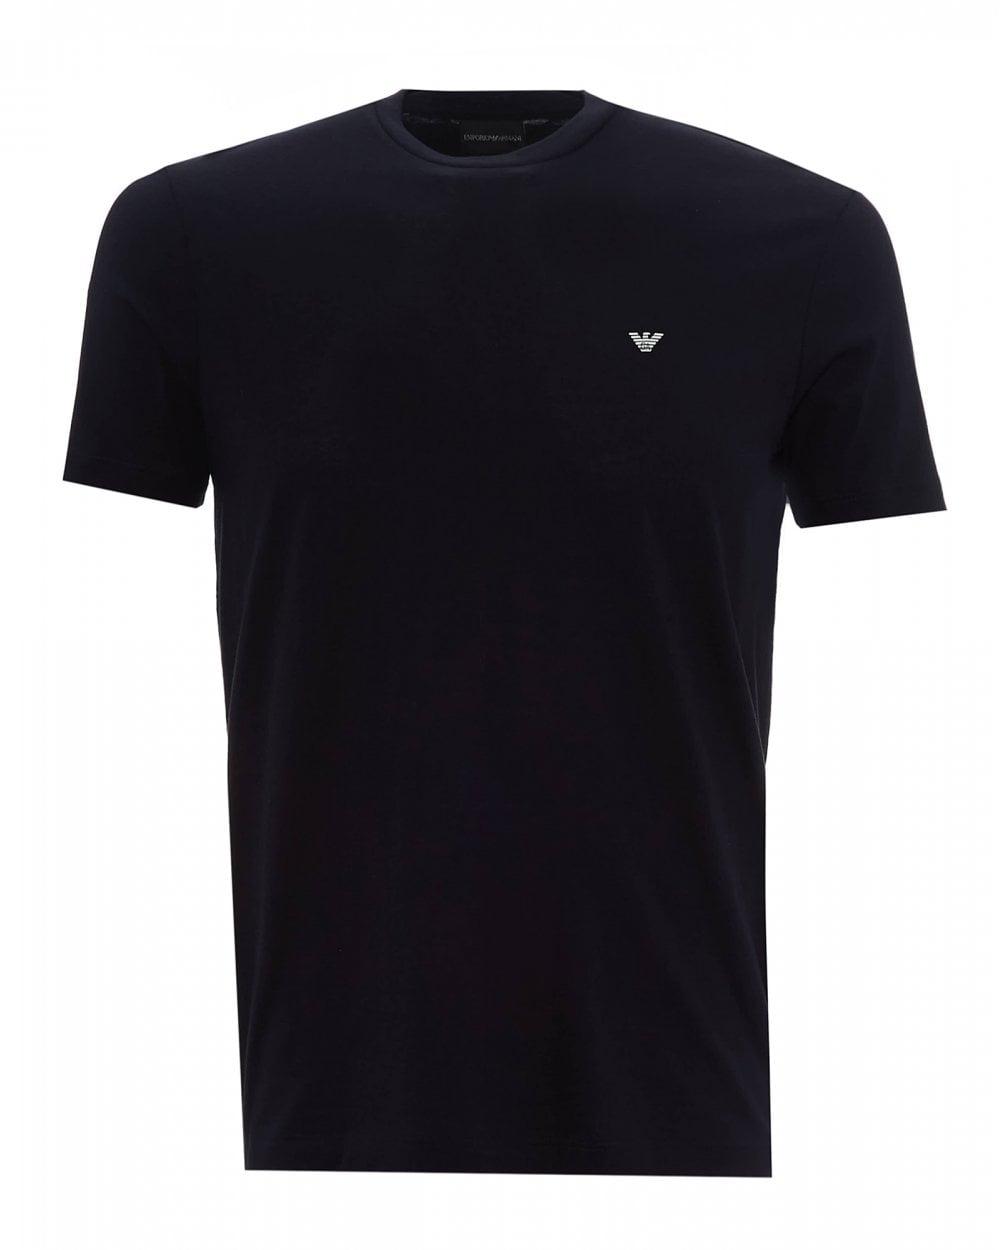 b4b9cc19 Emporio Armani Mens Basic Eagle Logo T-Shirt, Regular Fit Navy Tee